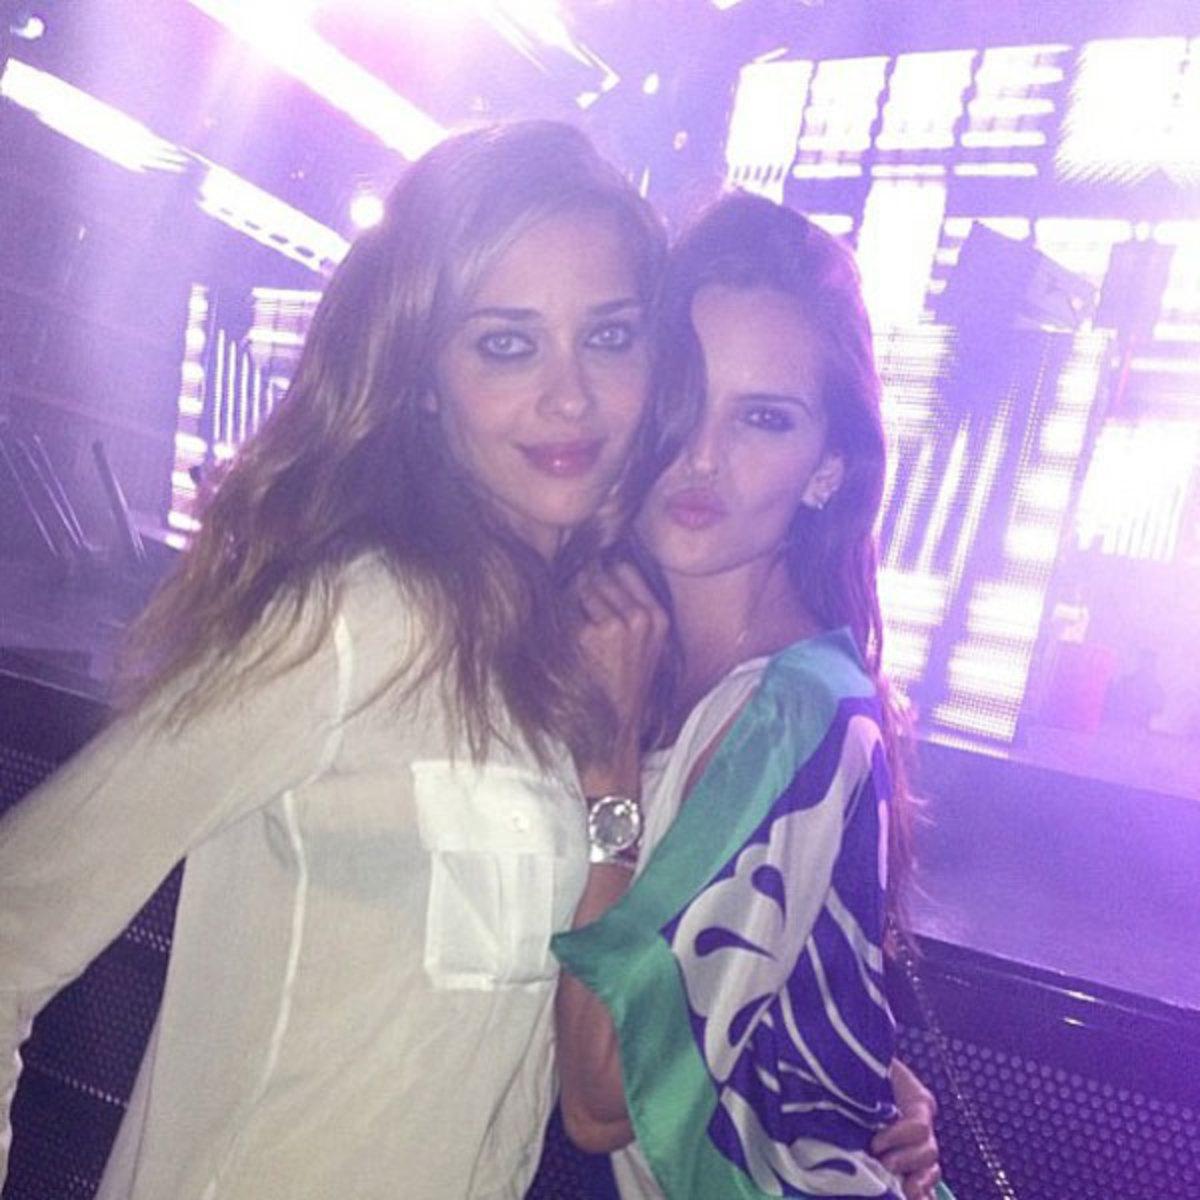 Ana Beatriz Barros and Izabel Goulart :: @izabel_goulart